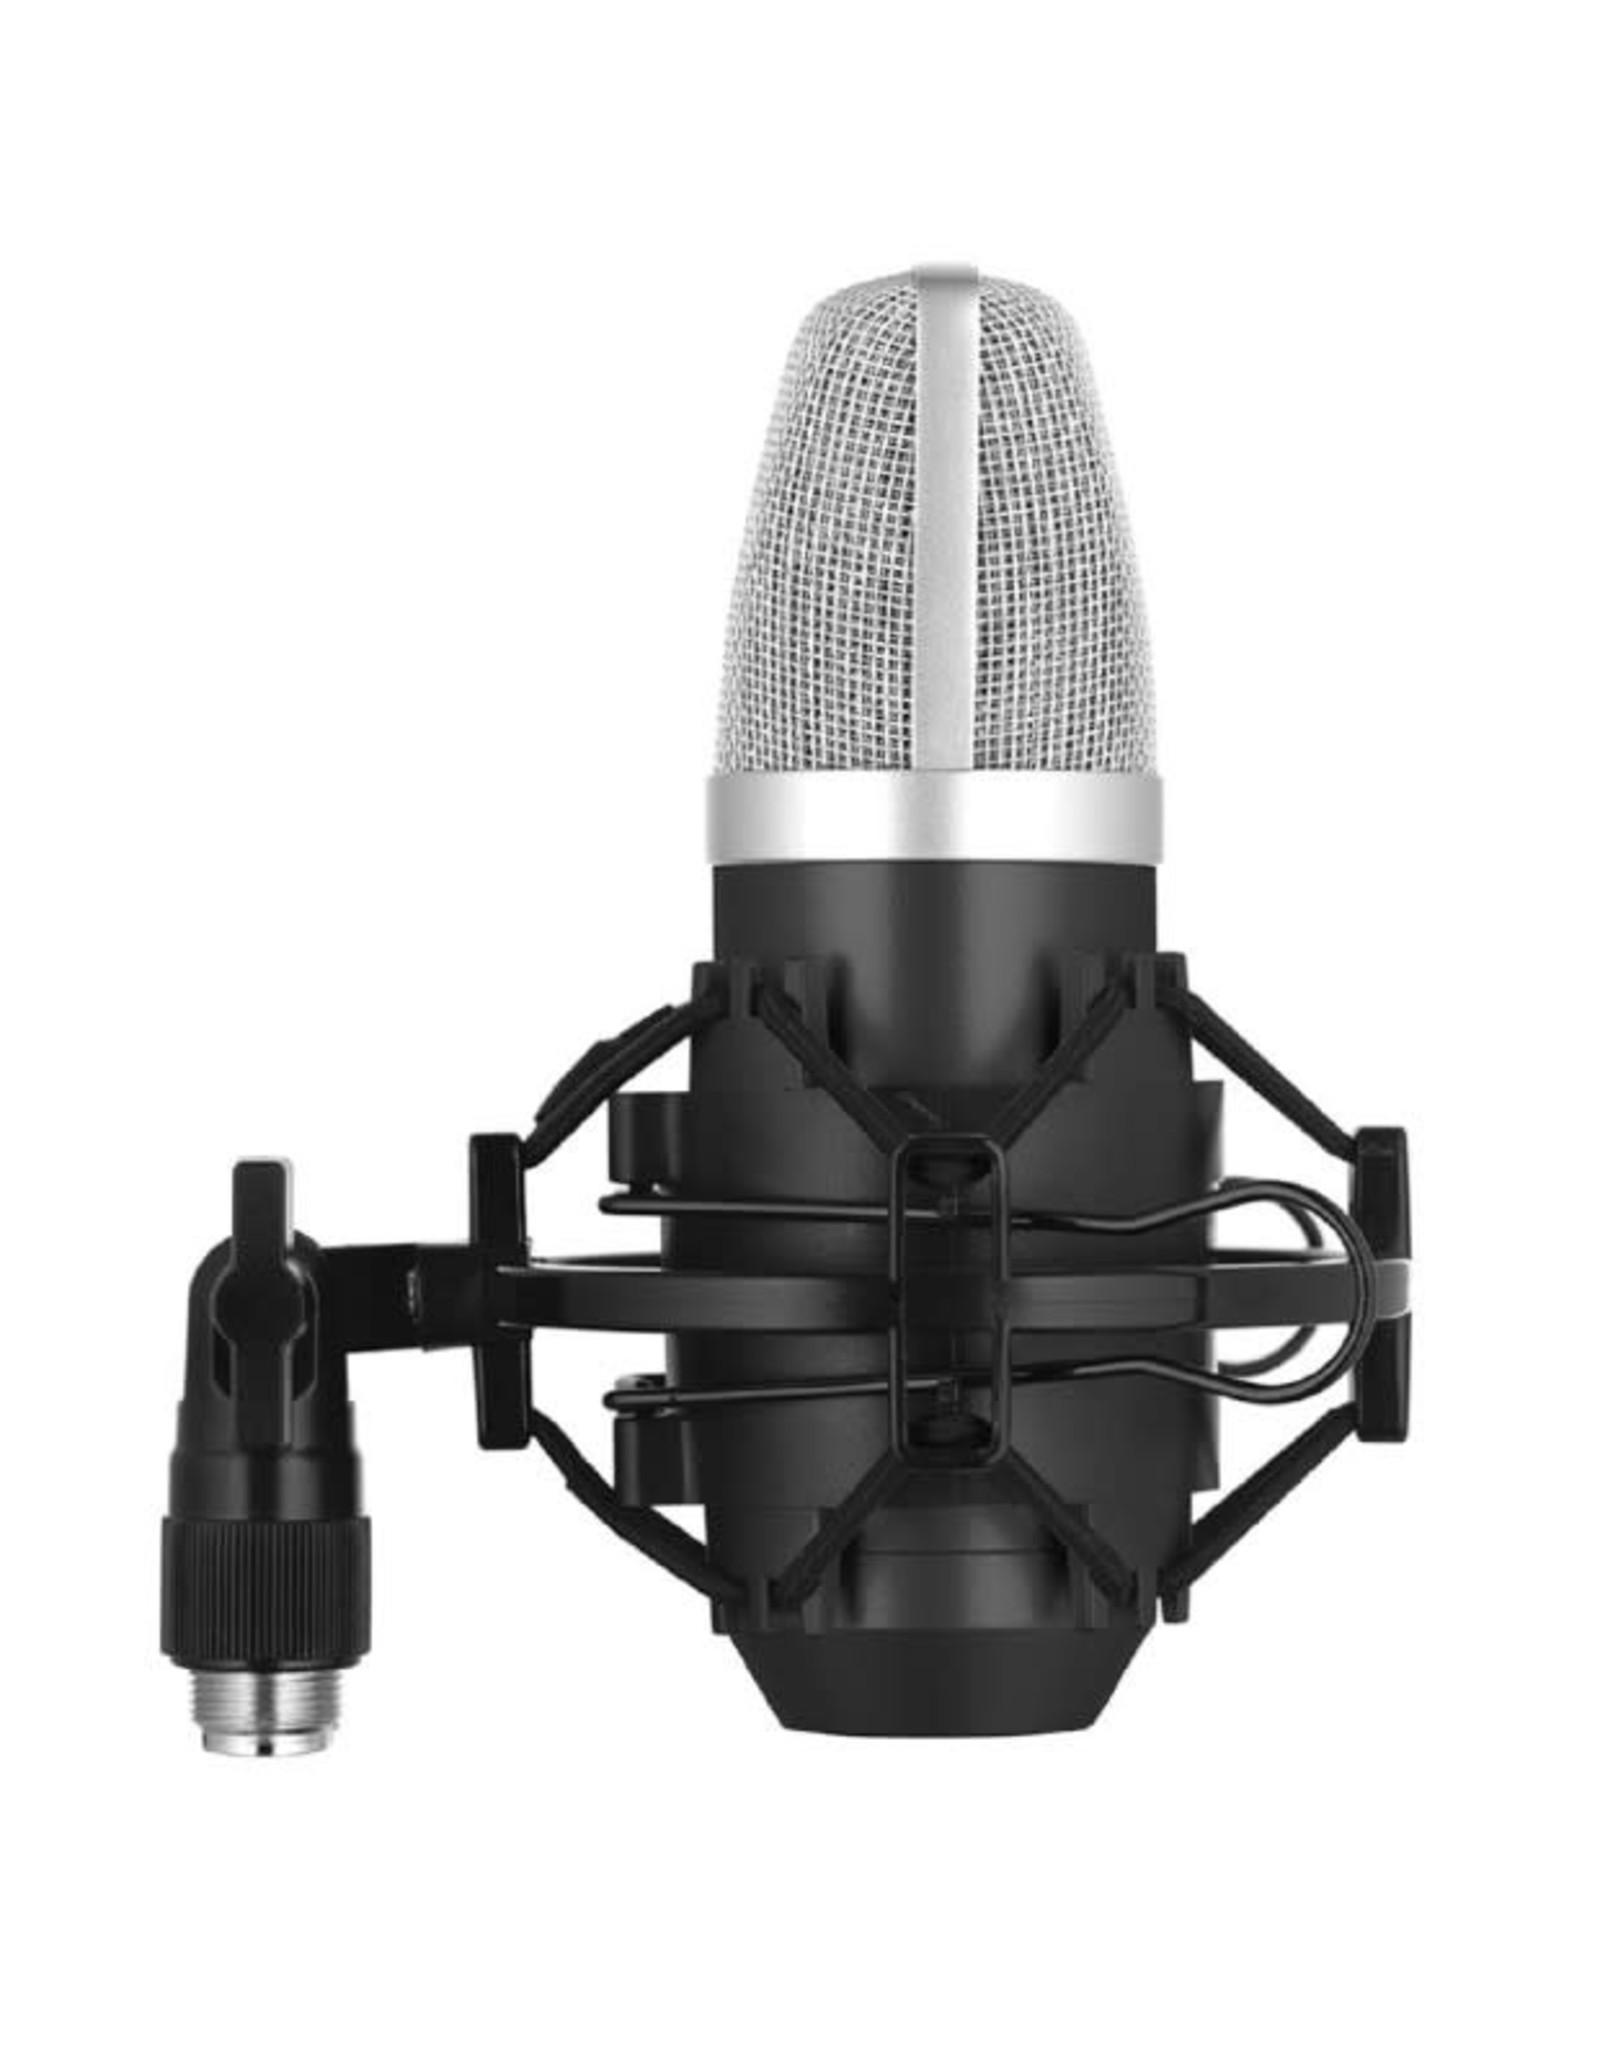 Stagg Stagg SUM40 USB Condenser Microphone